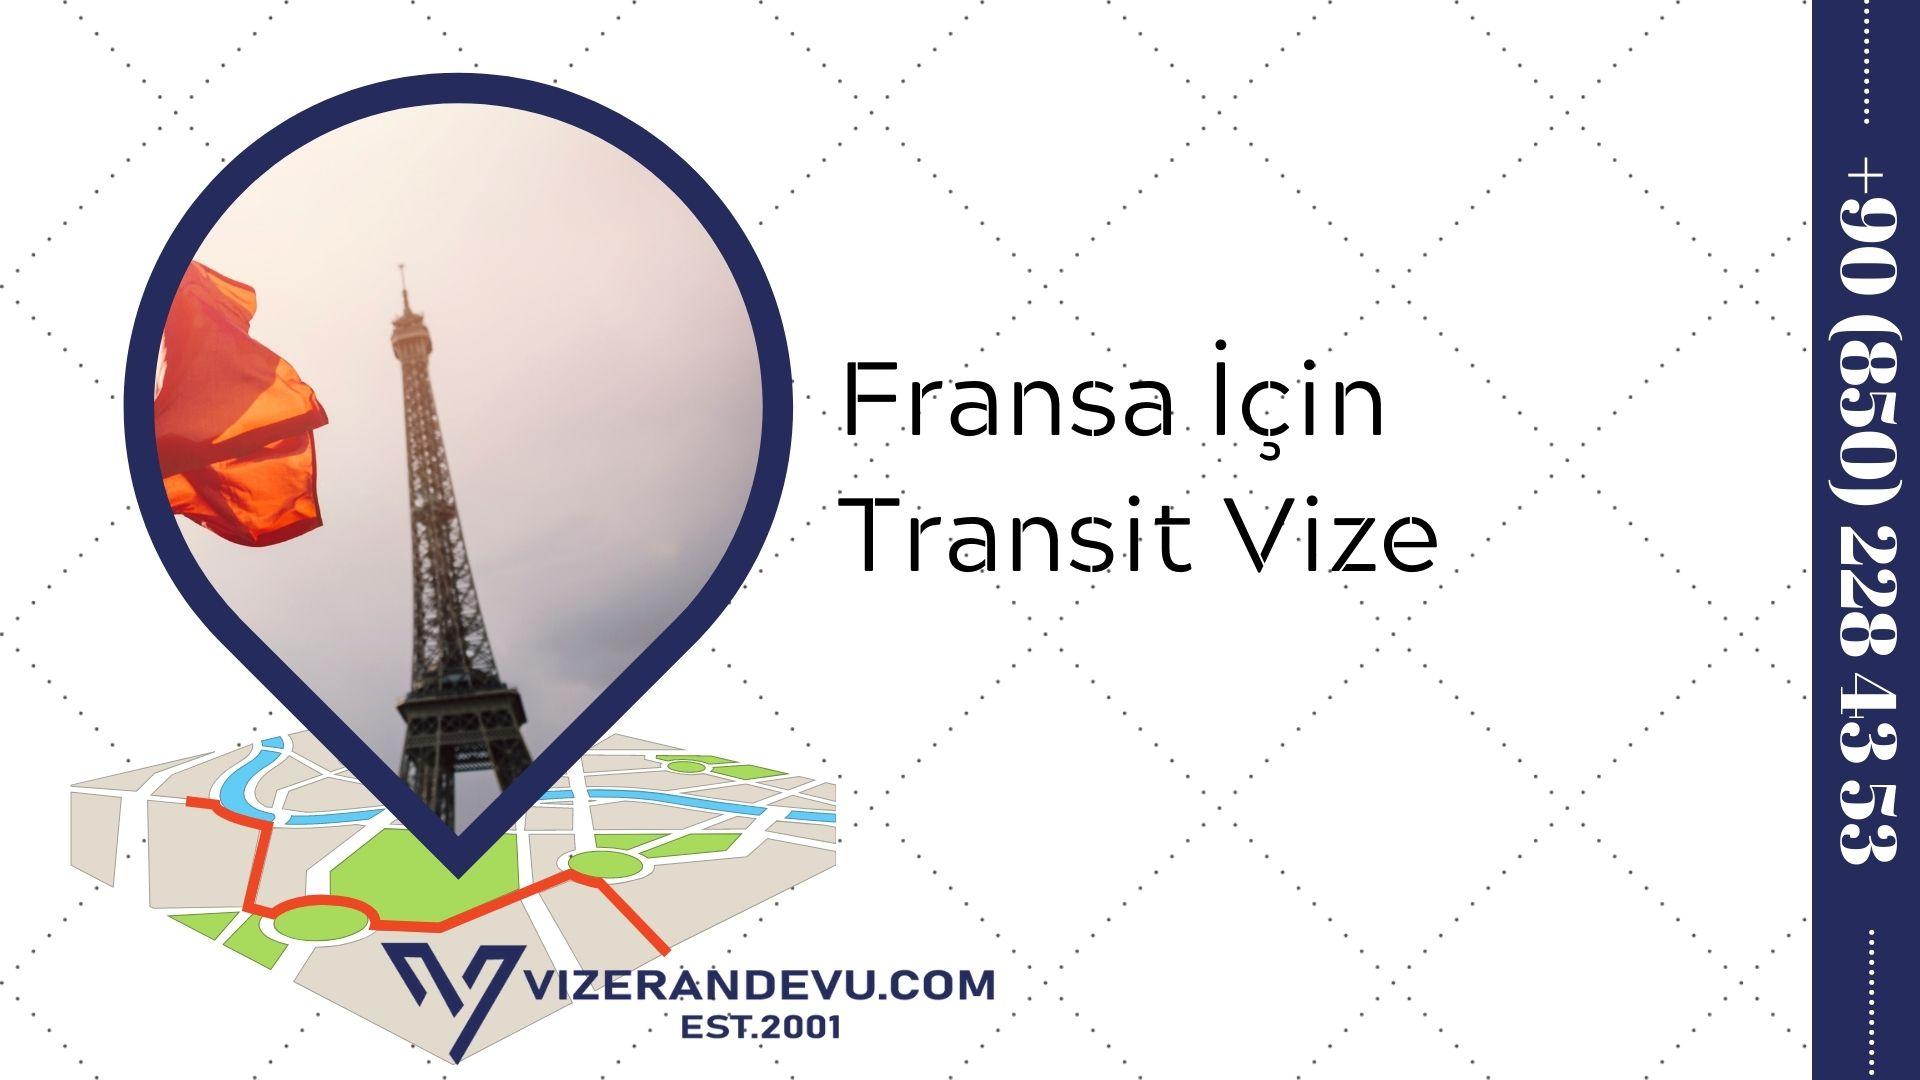 Fransa İçin Transit Vize